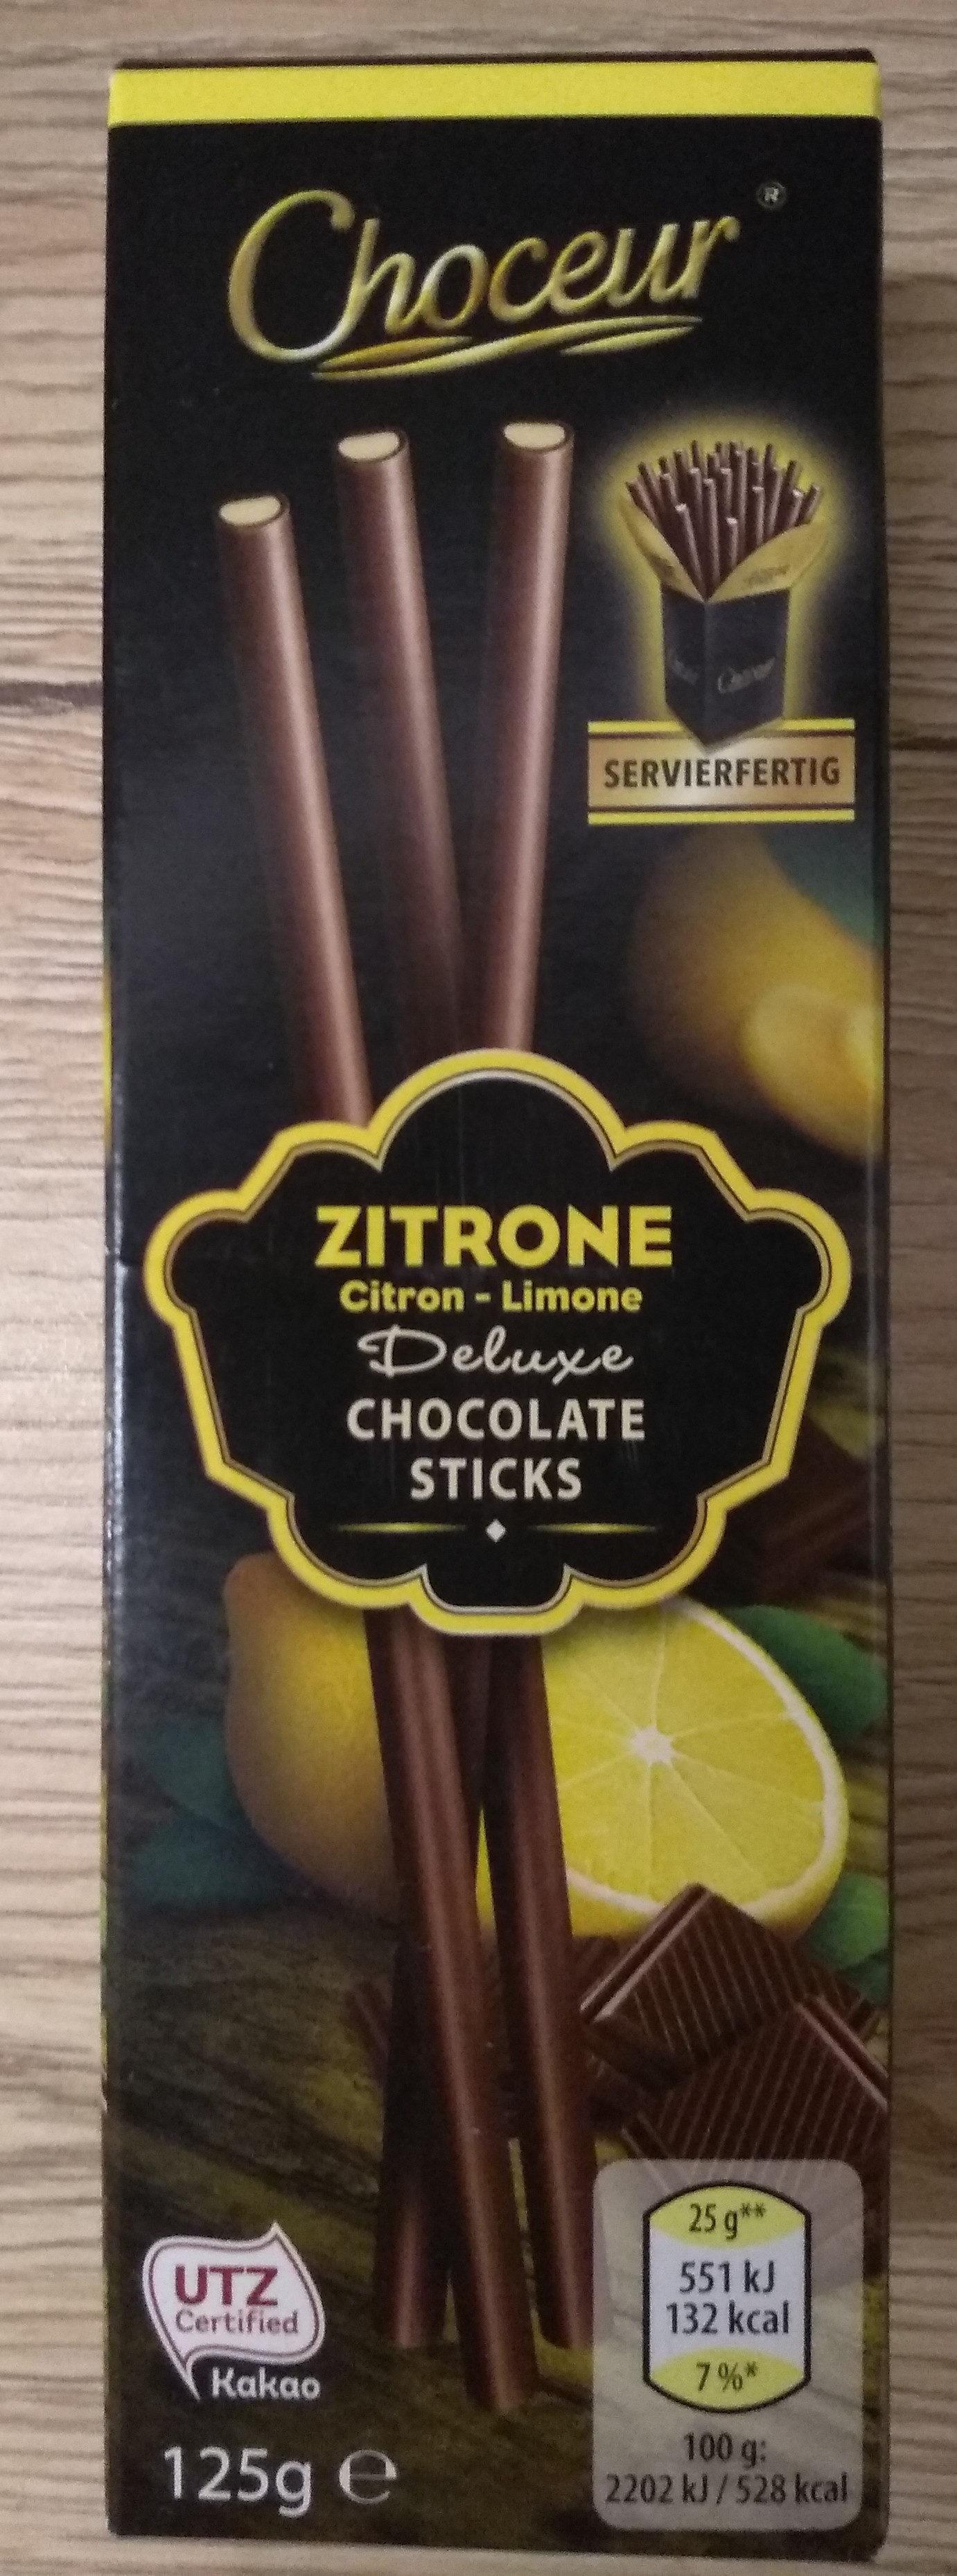 Deluxe chocolat sticks caramel - Produit - hu